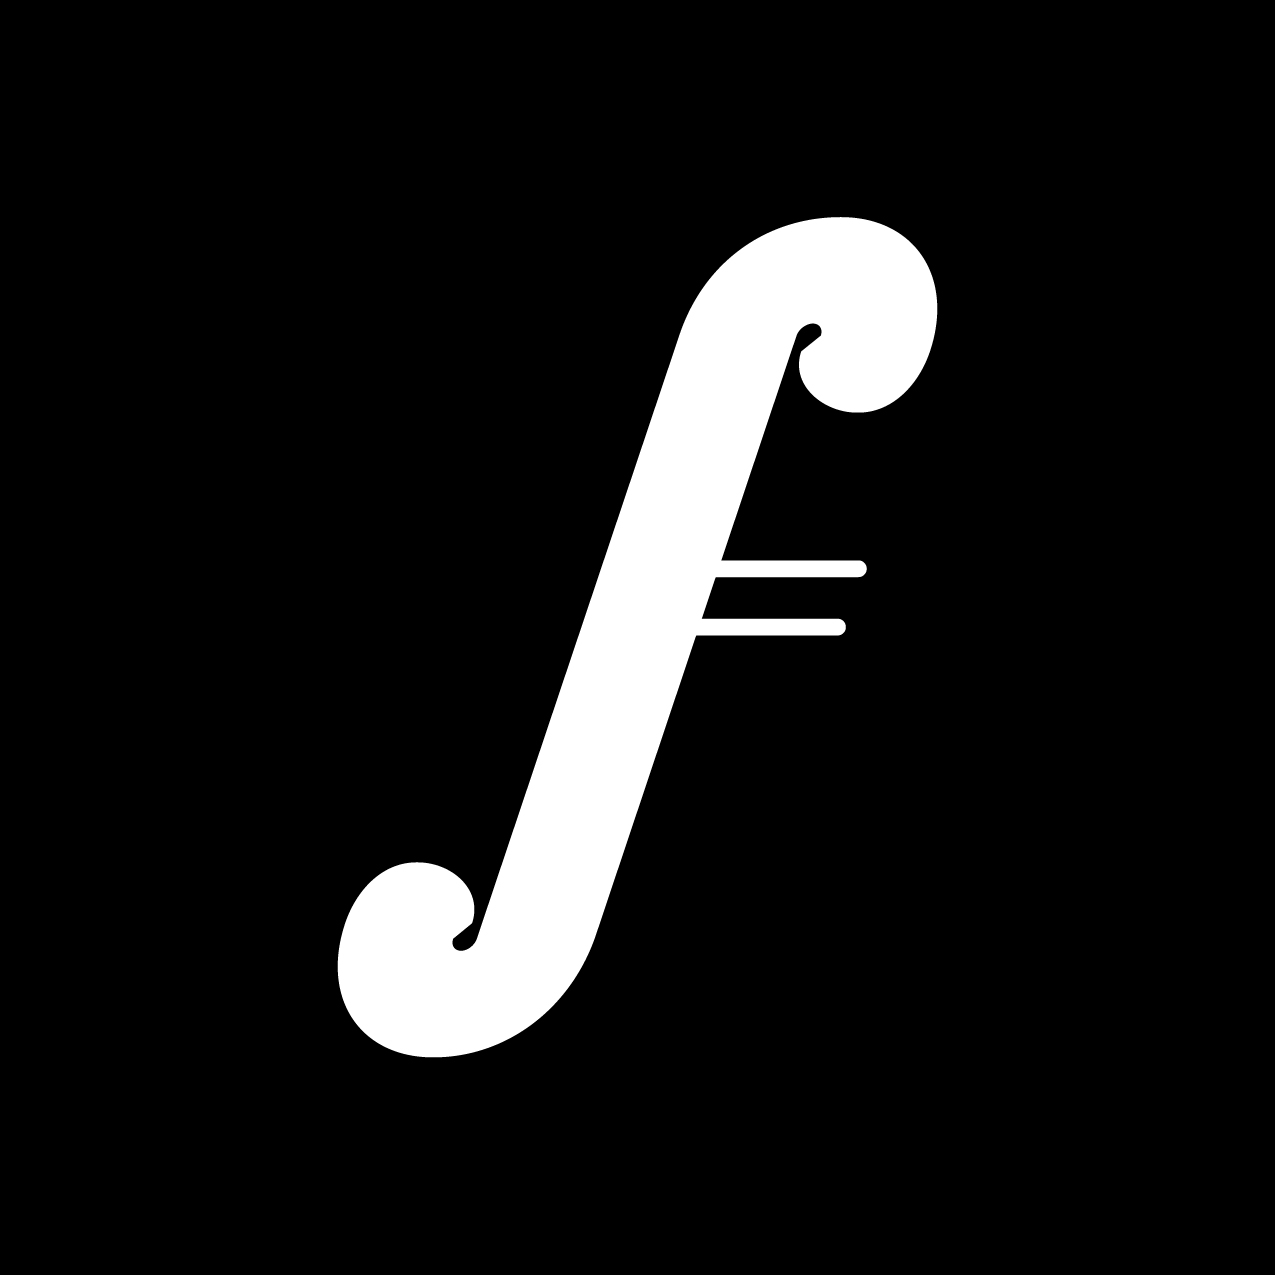 Letter F3 design by Furia